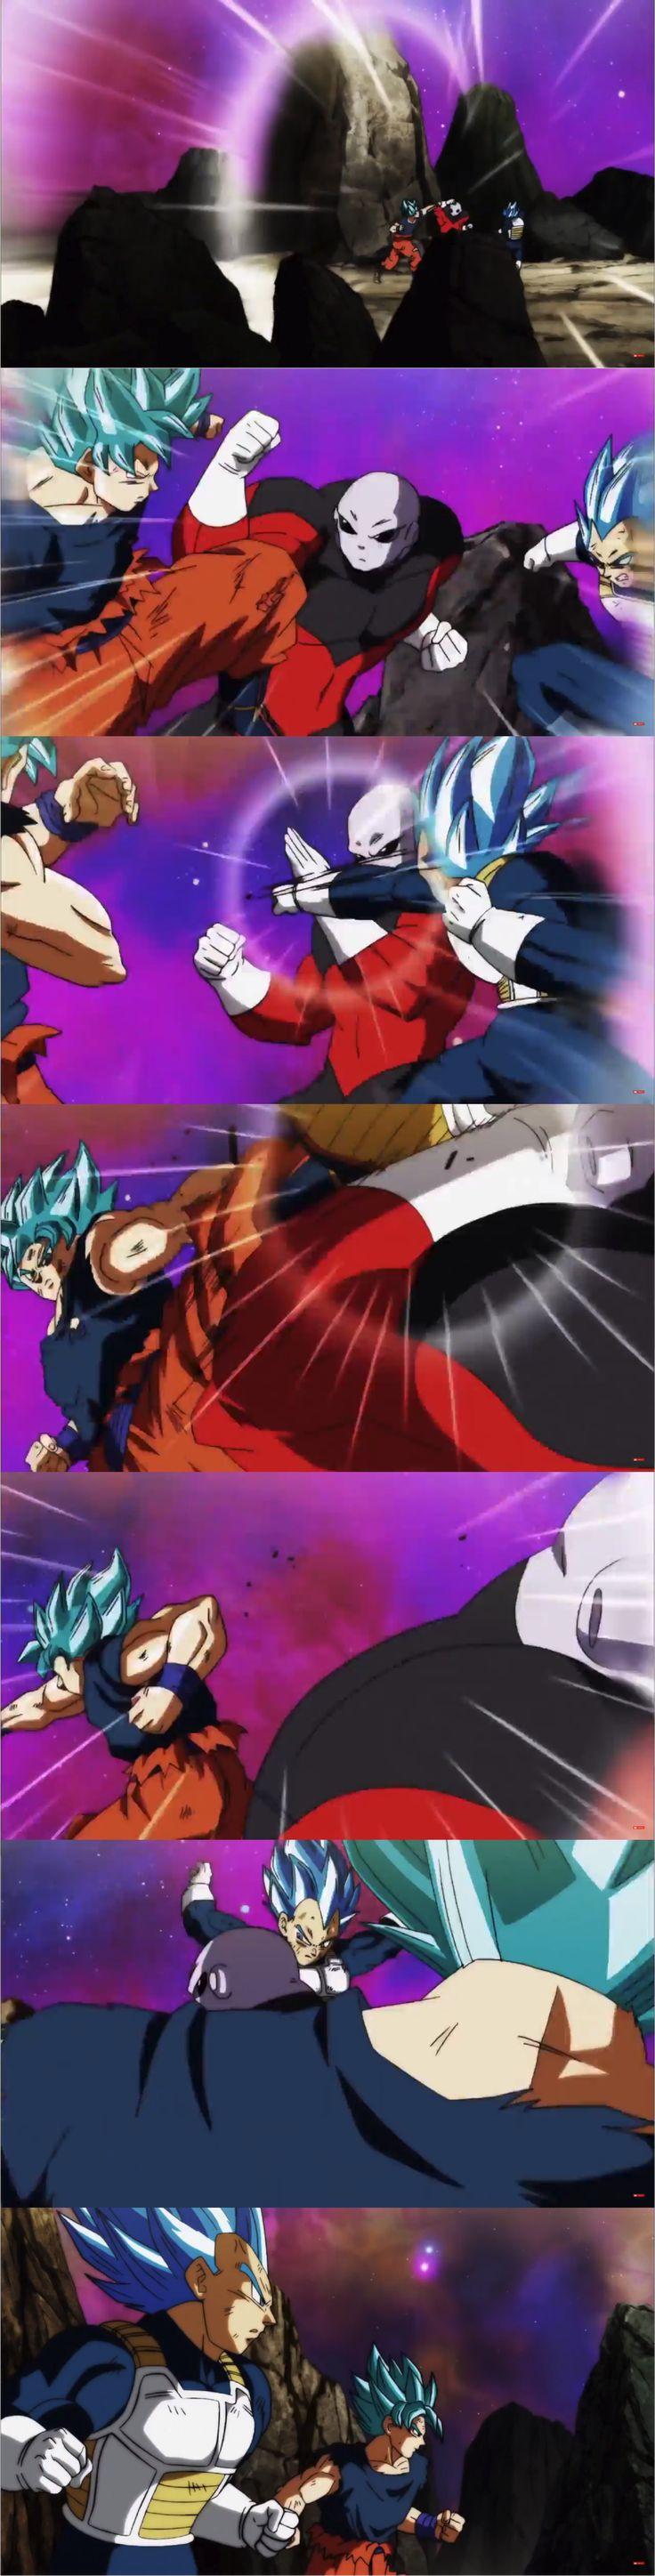 Dragon Ball Super (Goku. Vegito)